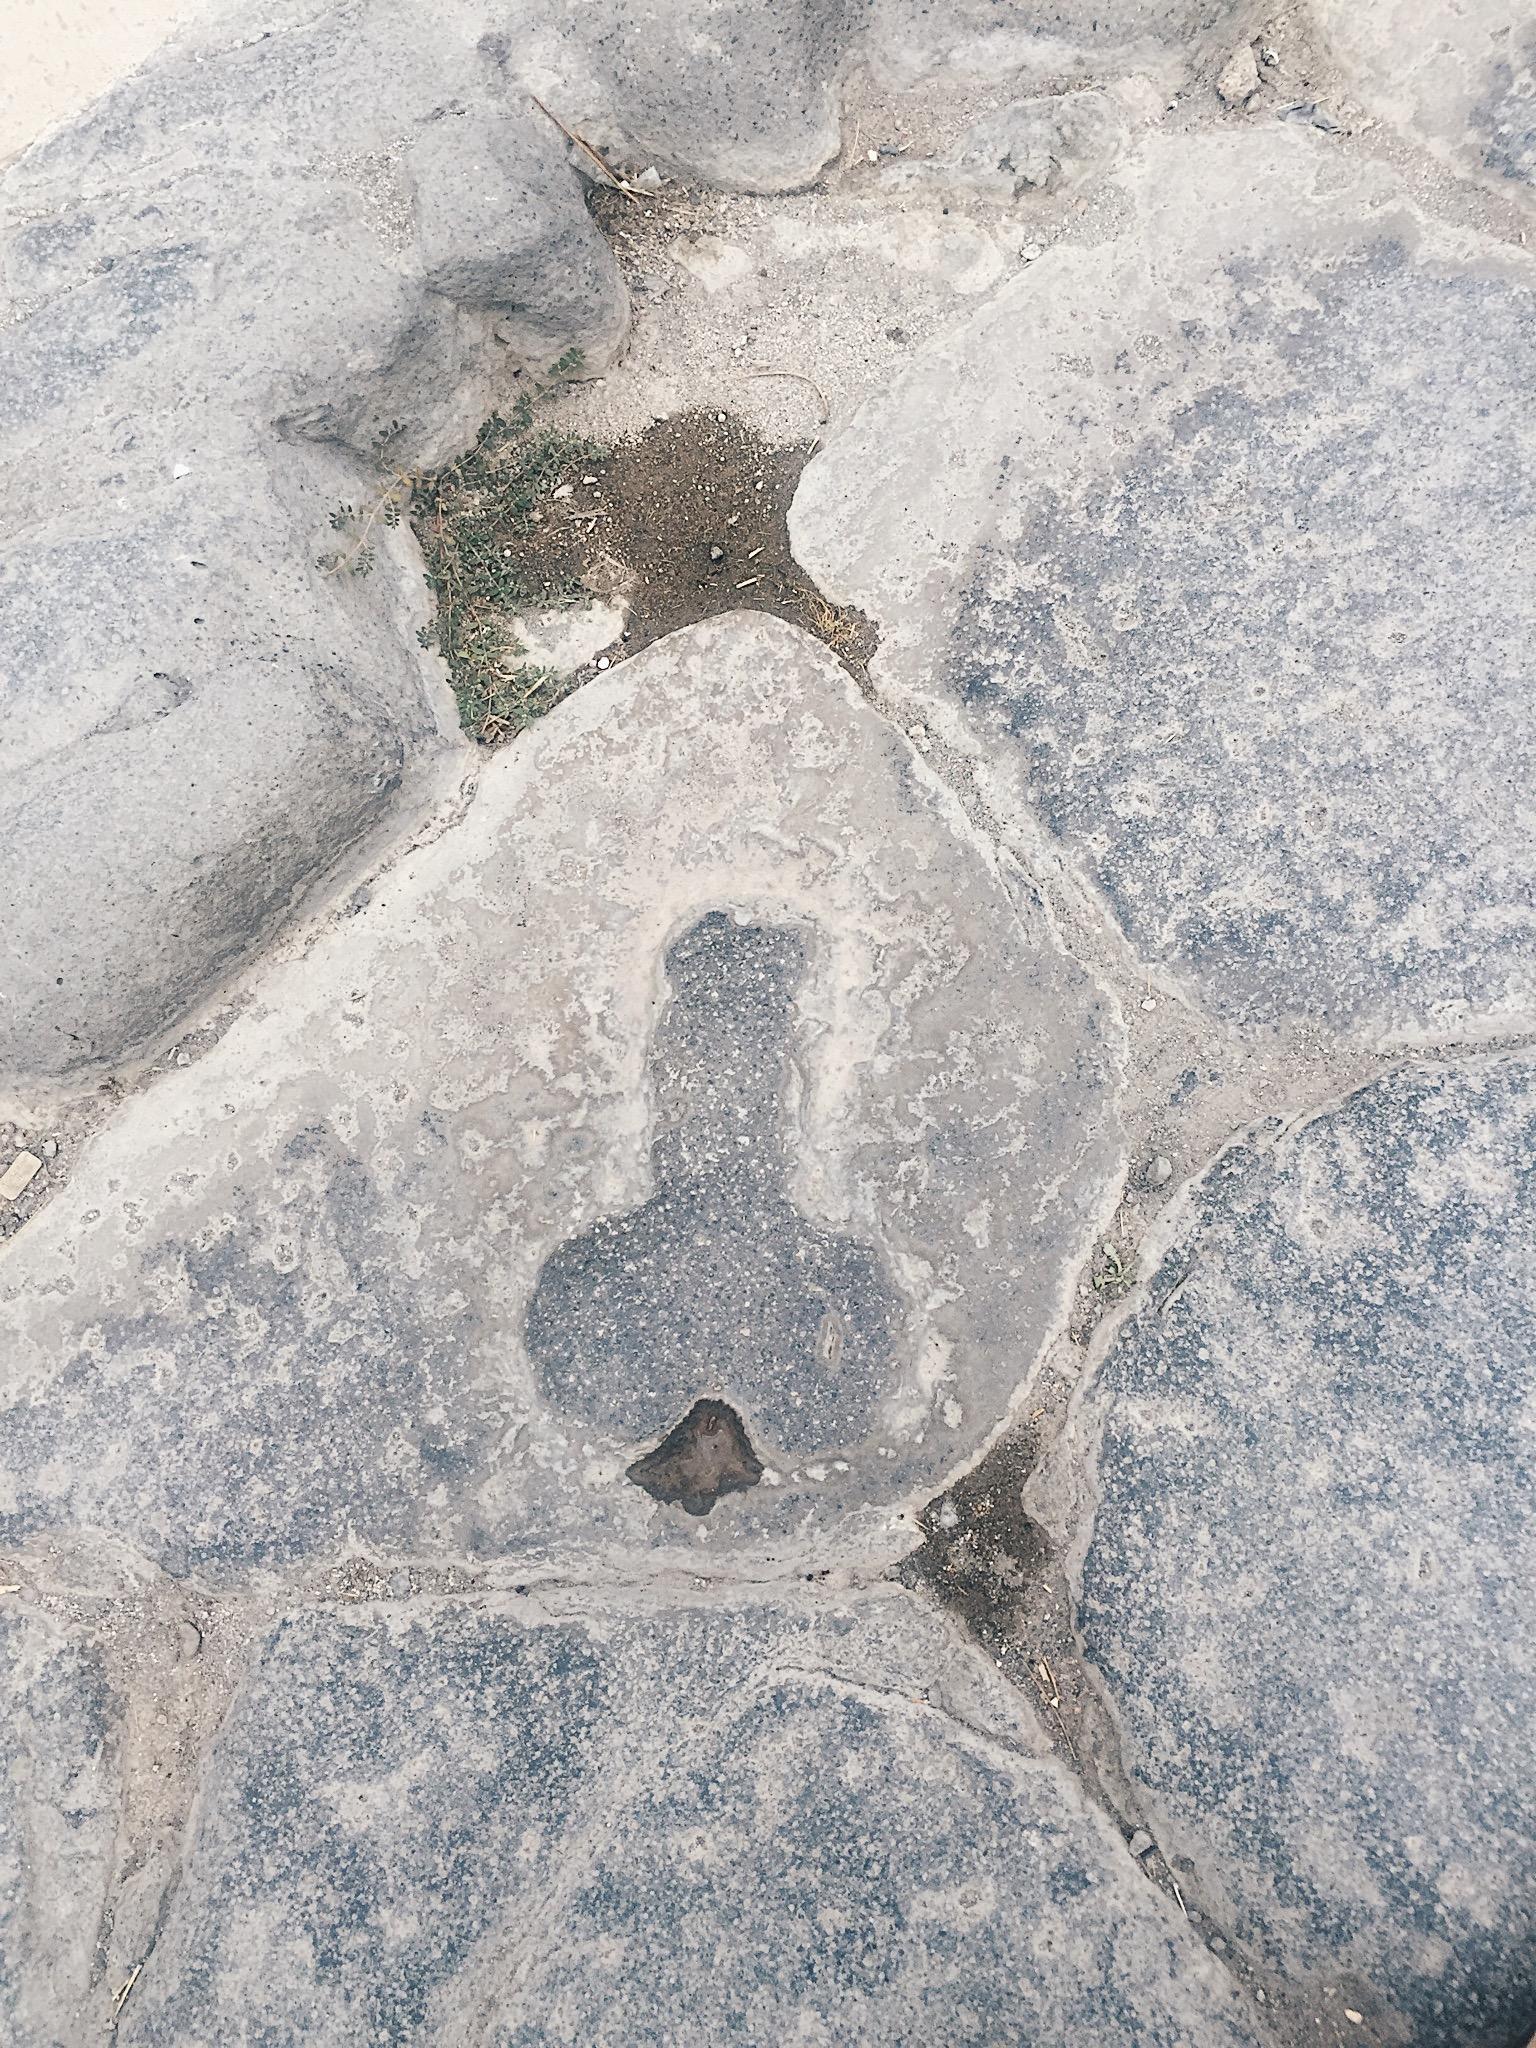 My Last Days of Pompeii Rory Mara The Attic on Eighth Phallus Stone.JPG